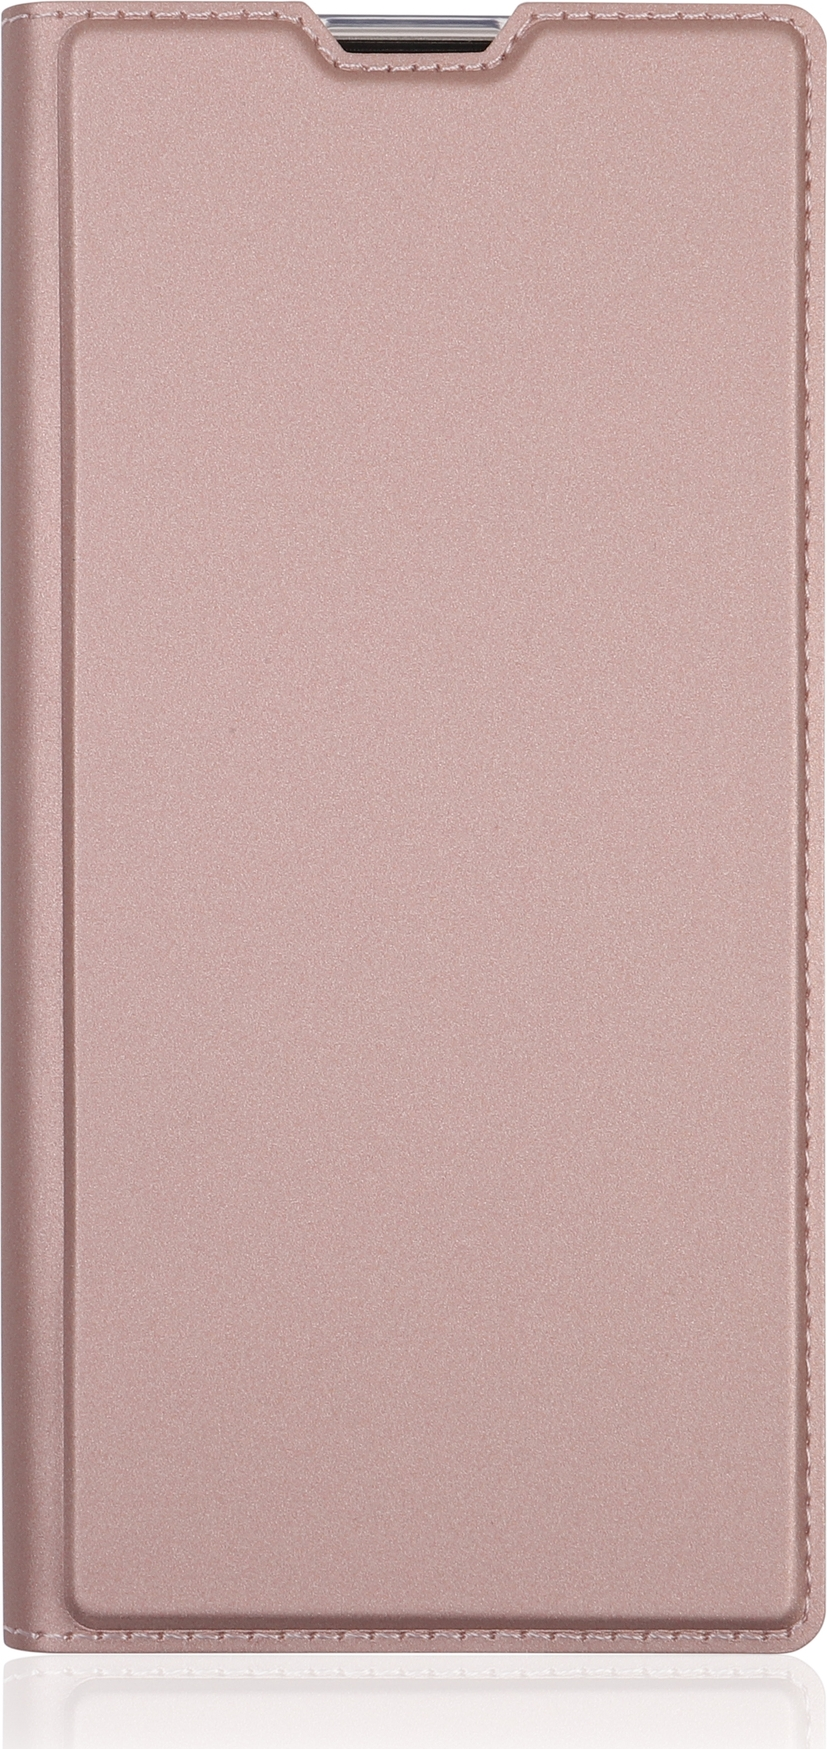 Чехол Brosco Book для Sony Xperia XA2 Plus, розовый чехол для sony i4213 xperia 10 plus brosco силиконовая накладка черный